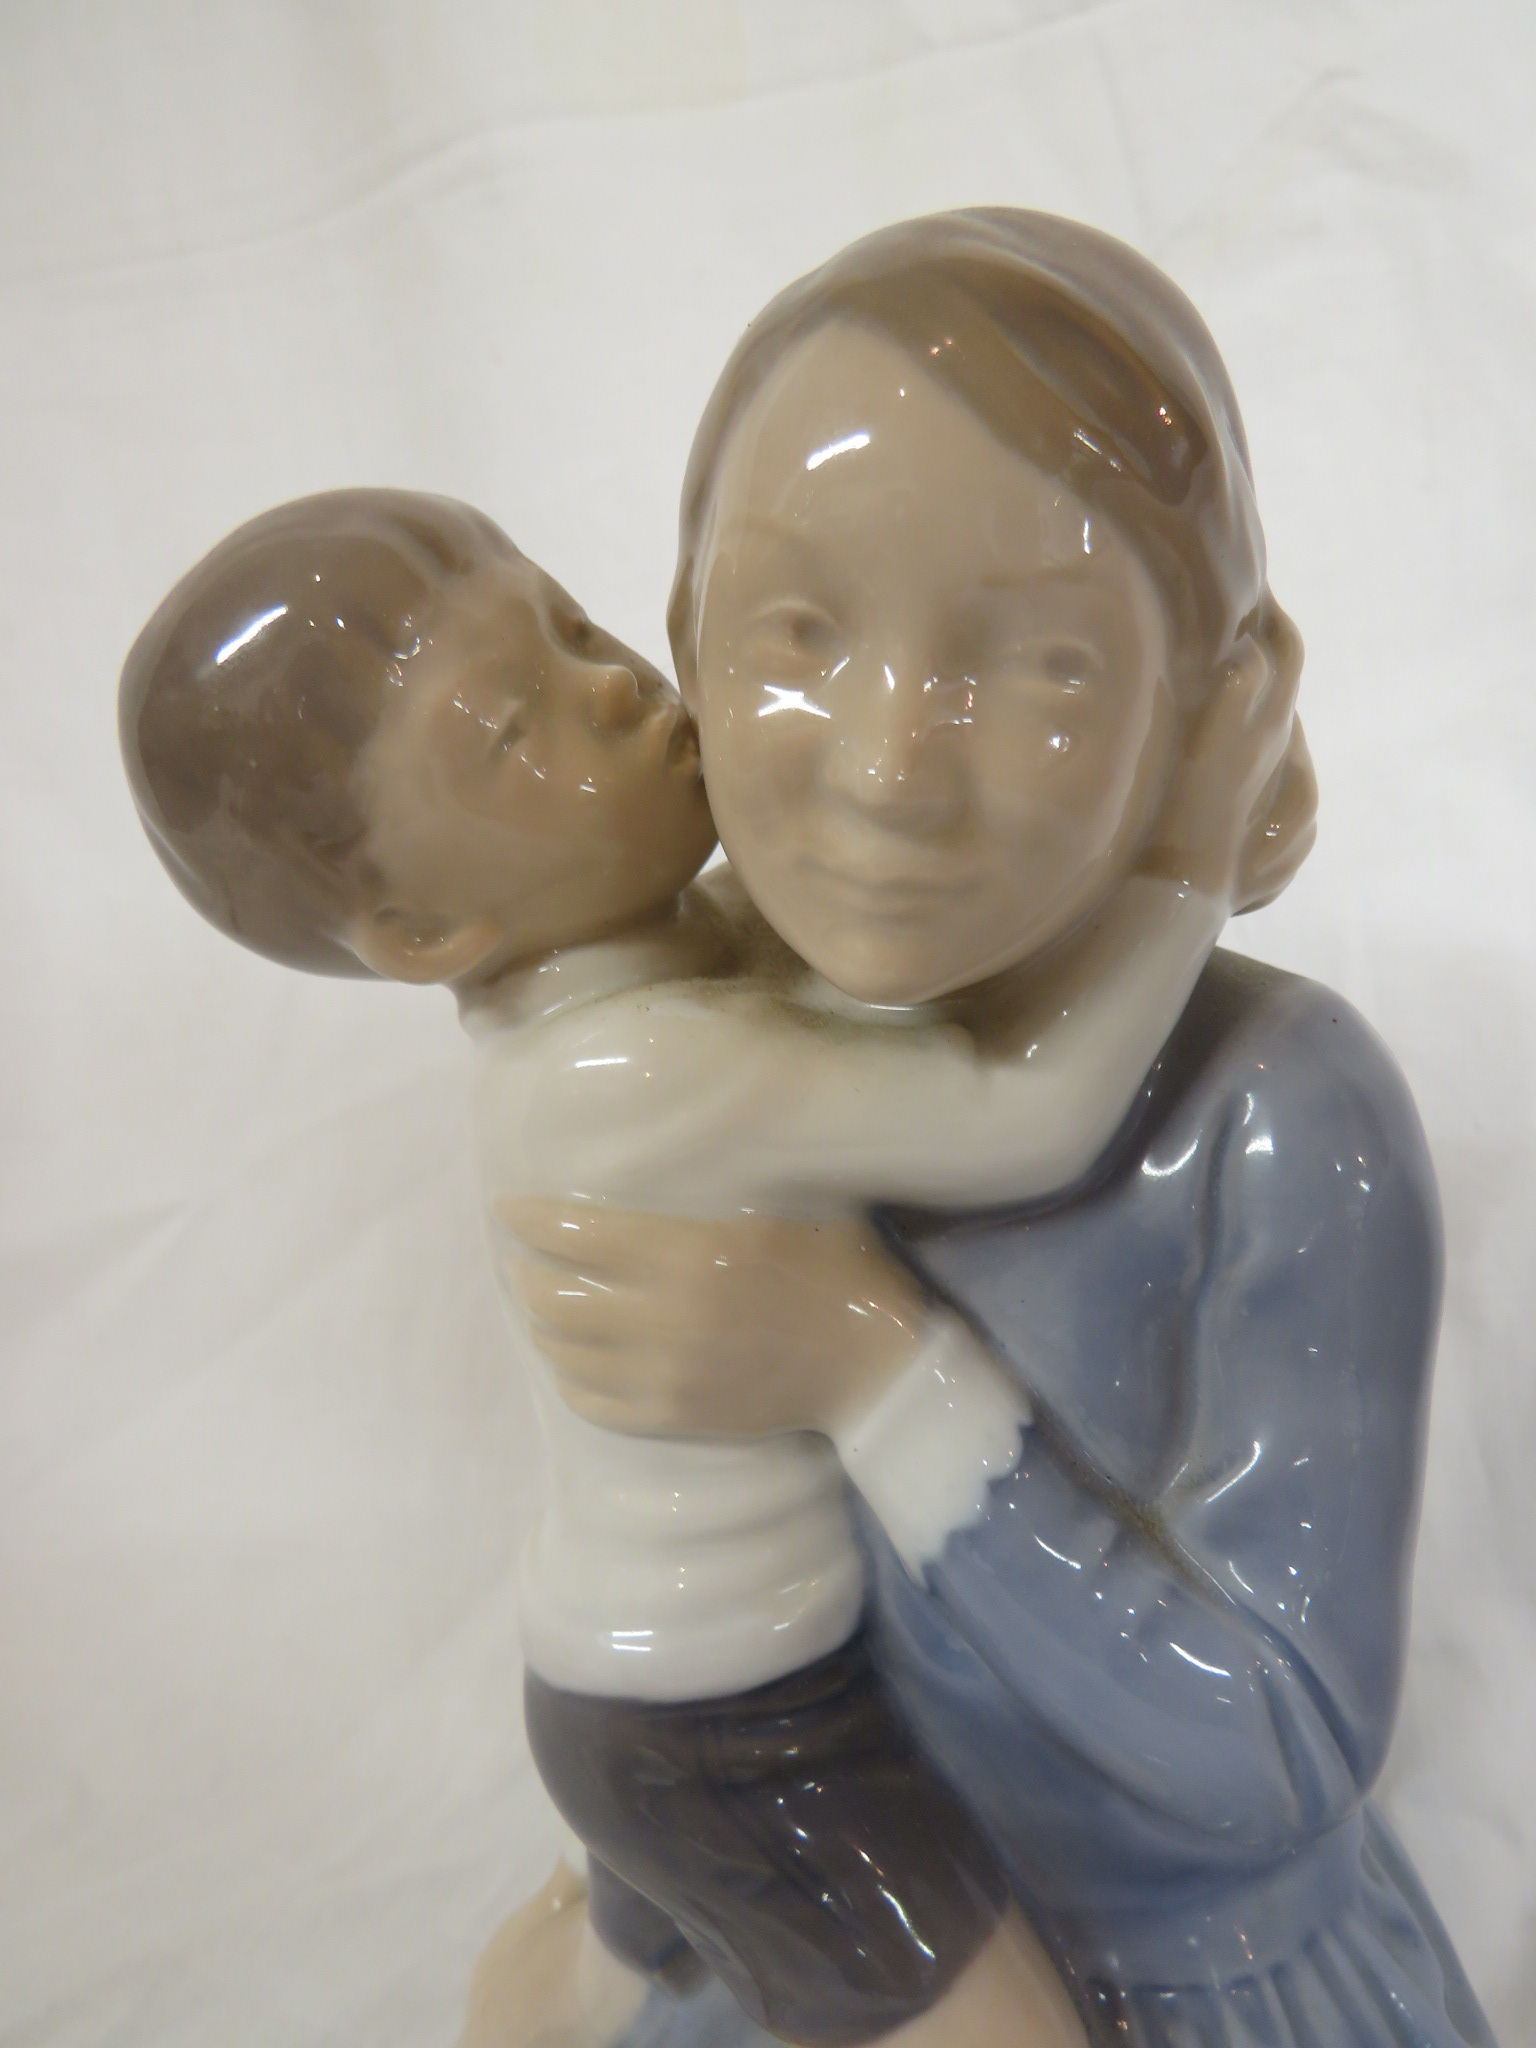 Lot 75 - Royal Copenhagen porcelain figural group of mother and child, number 3457, impressed initials FC,